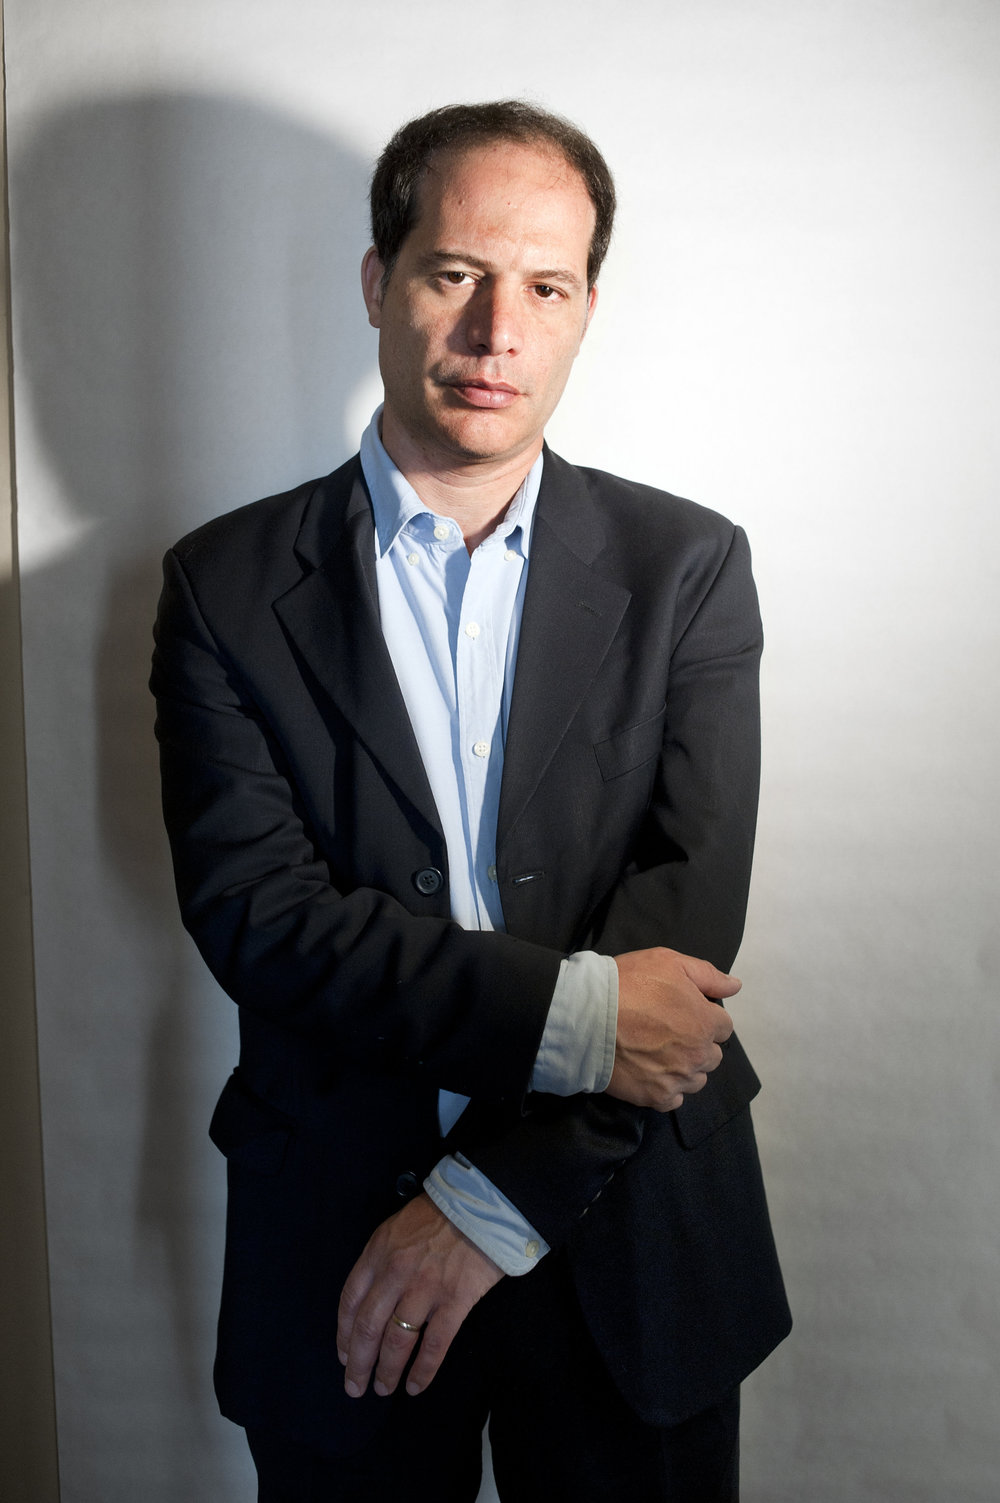 Copy of Simon Kuper